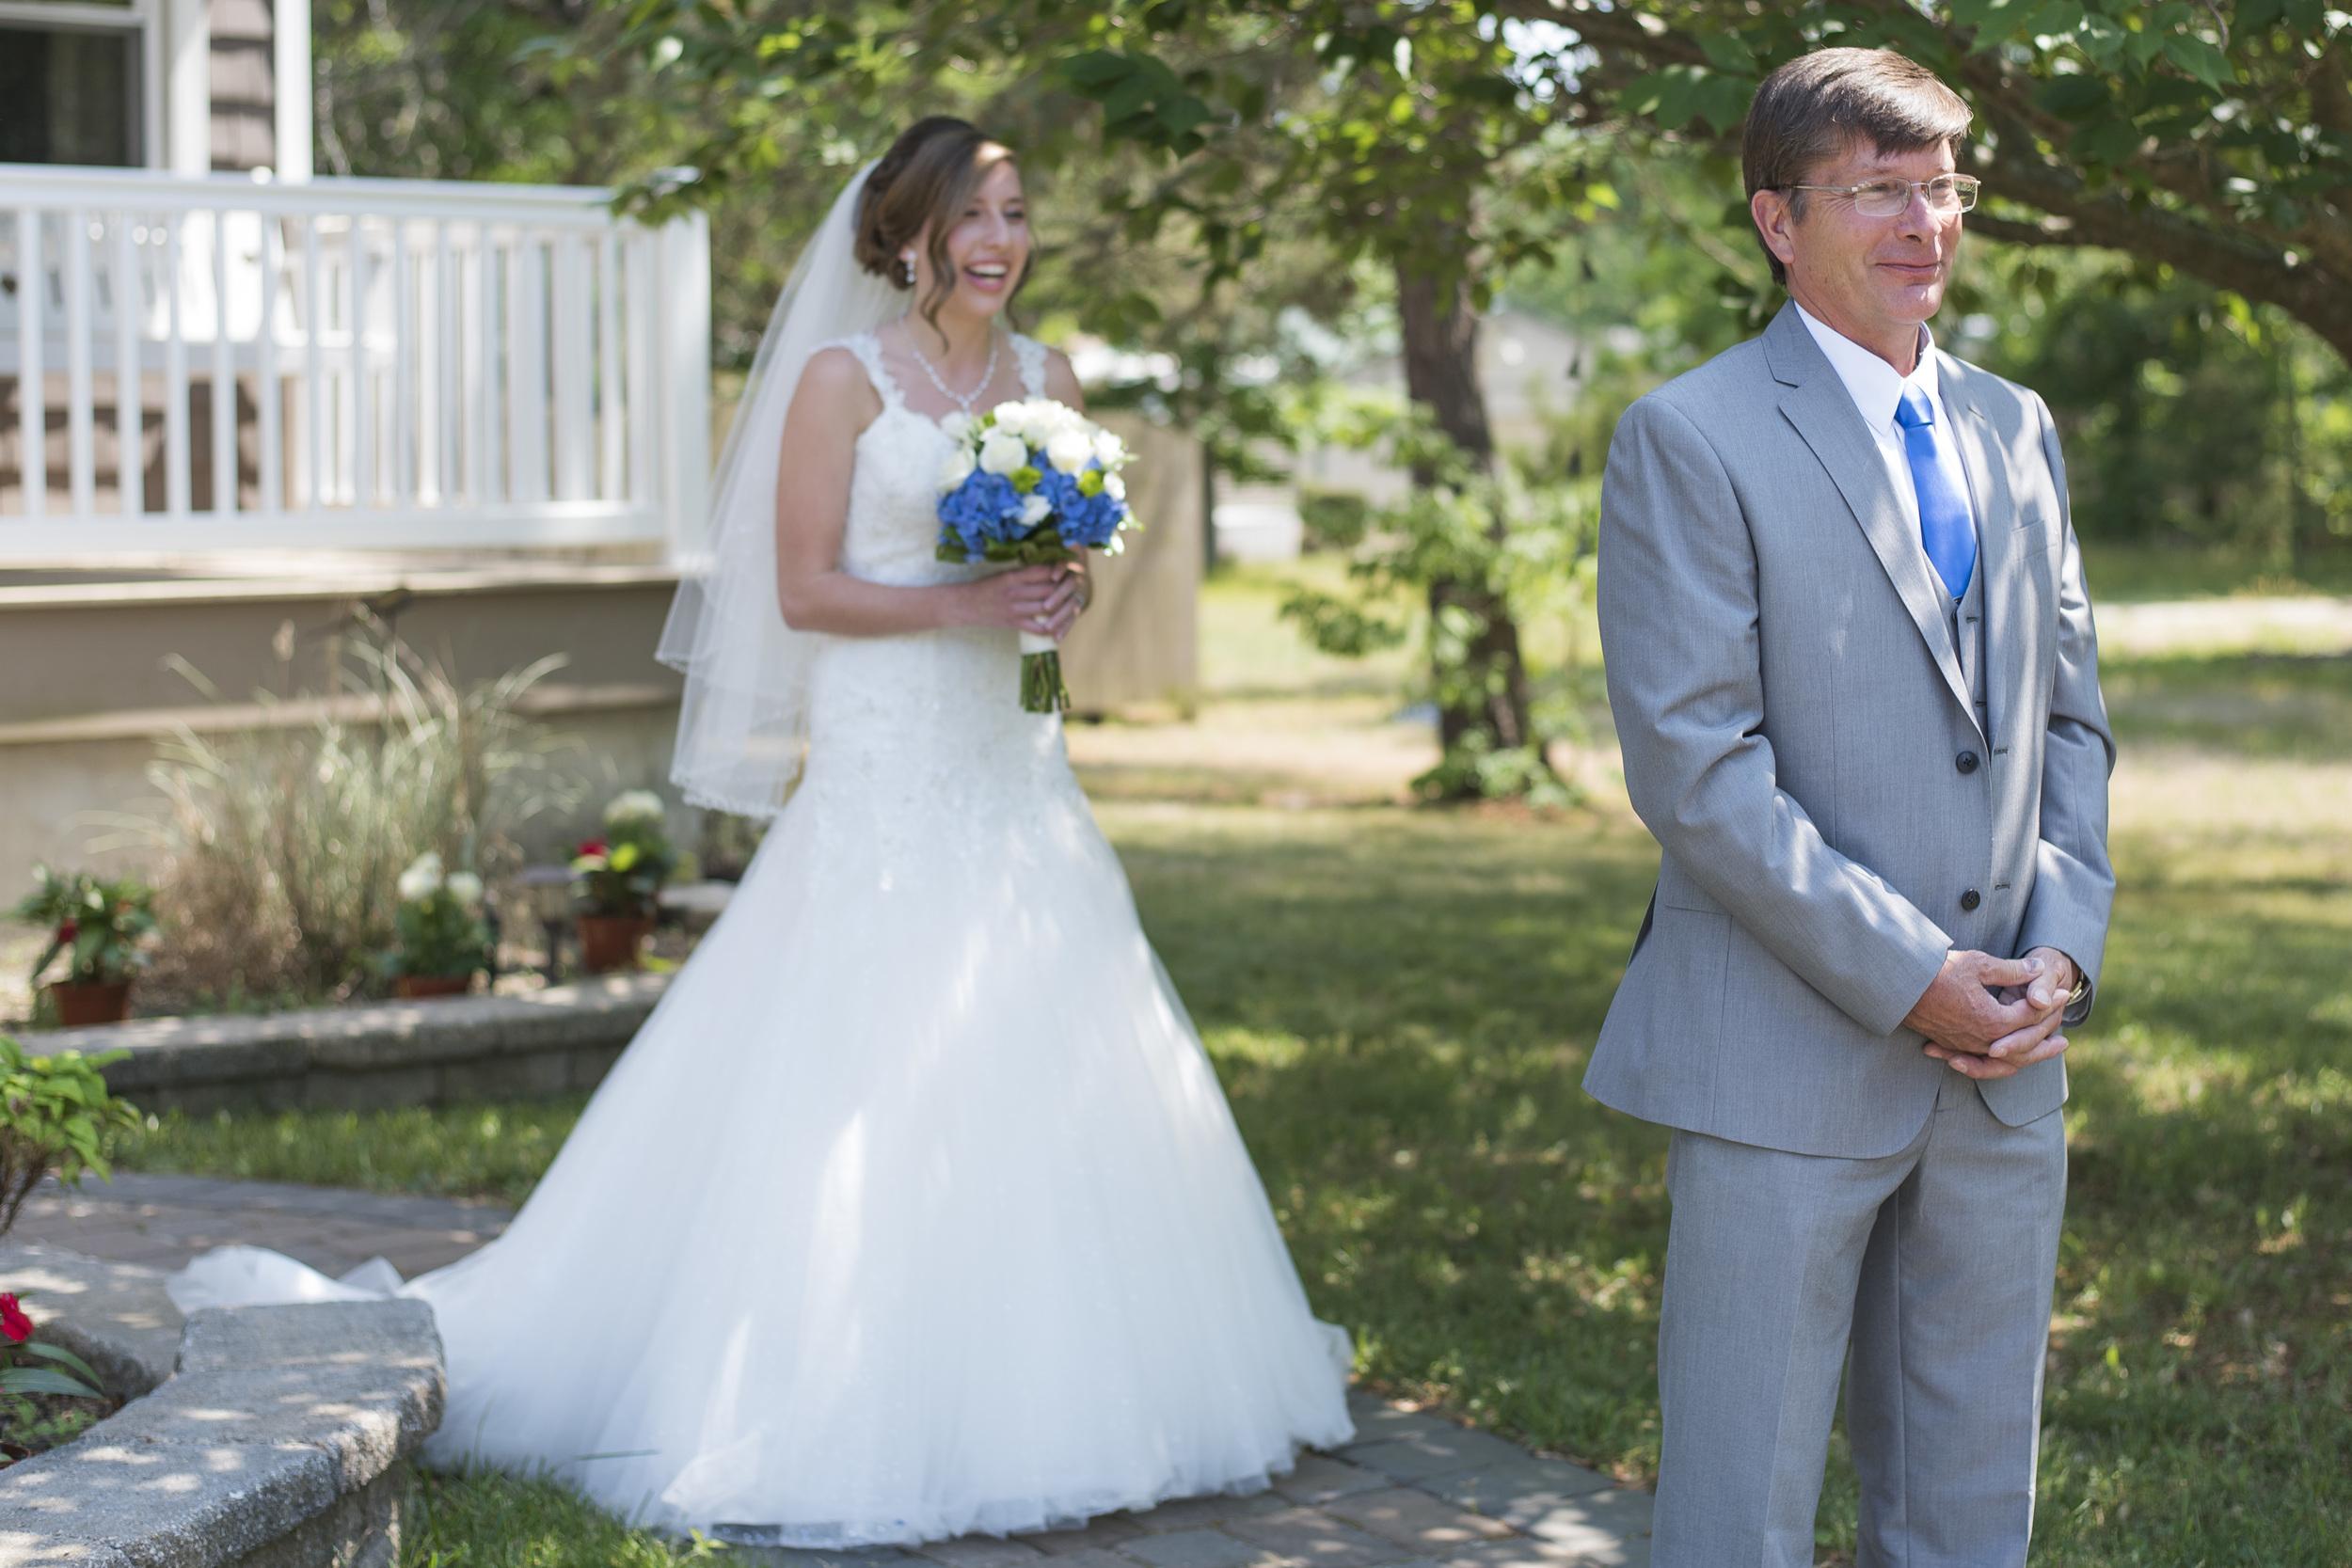 New_jersey_blue_heron_pines_wedding20150529_0525.jpg